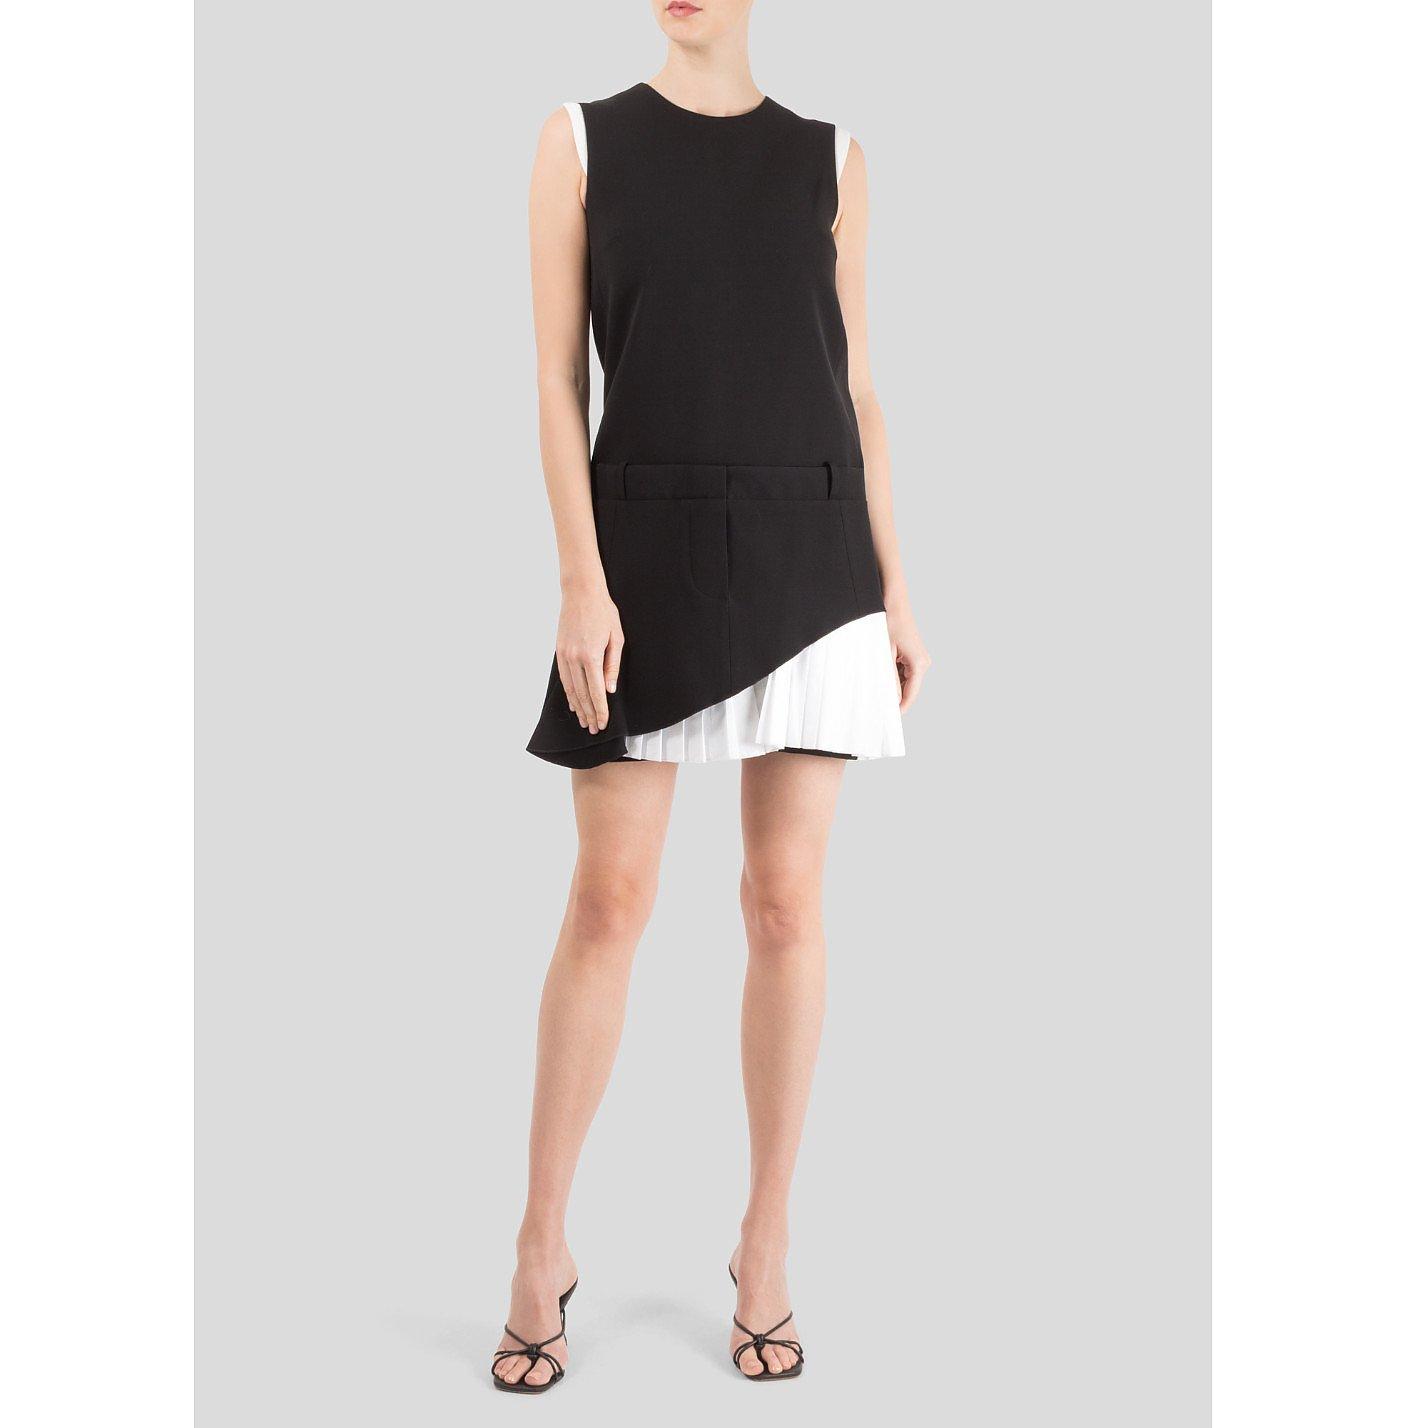 Victoria Beckham Pleated Skirt Mini Dress